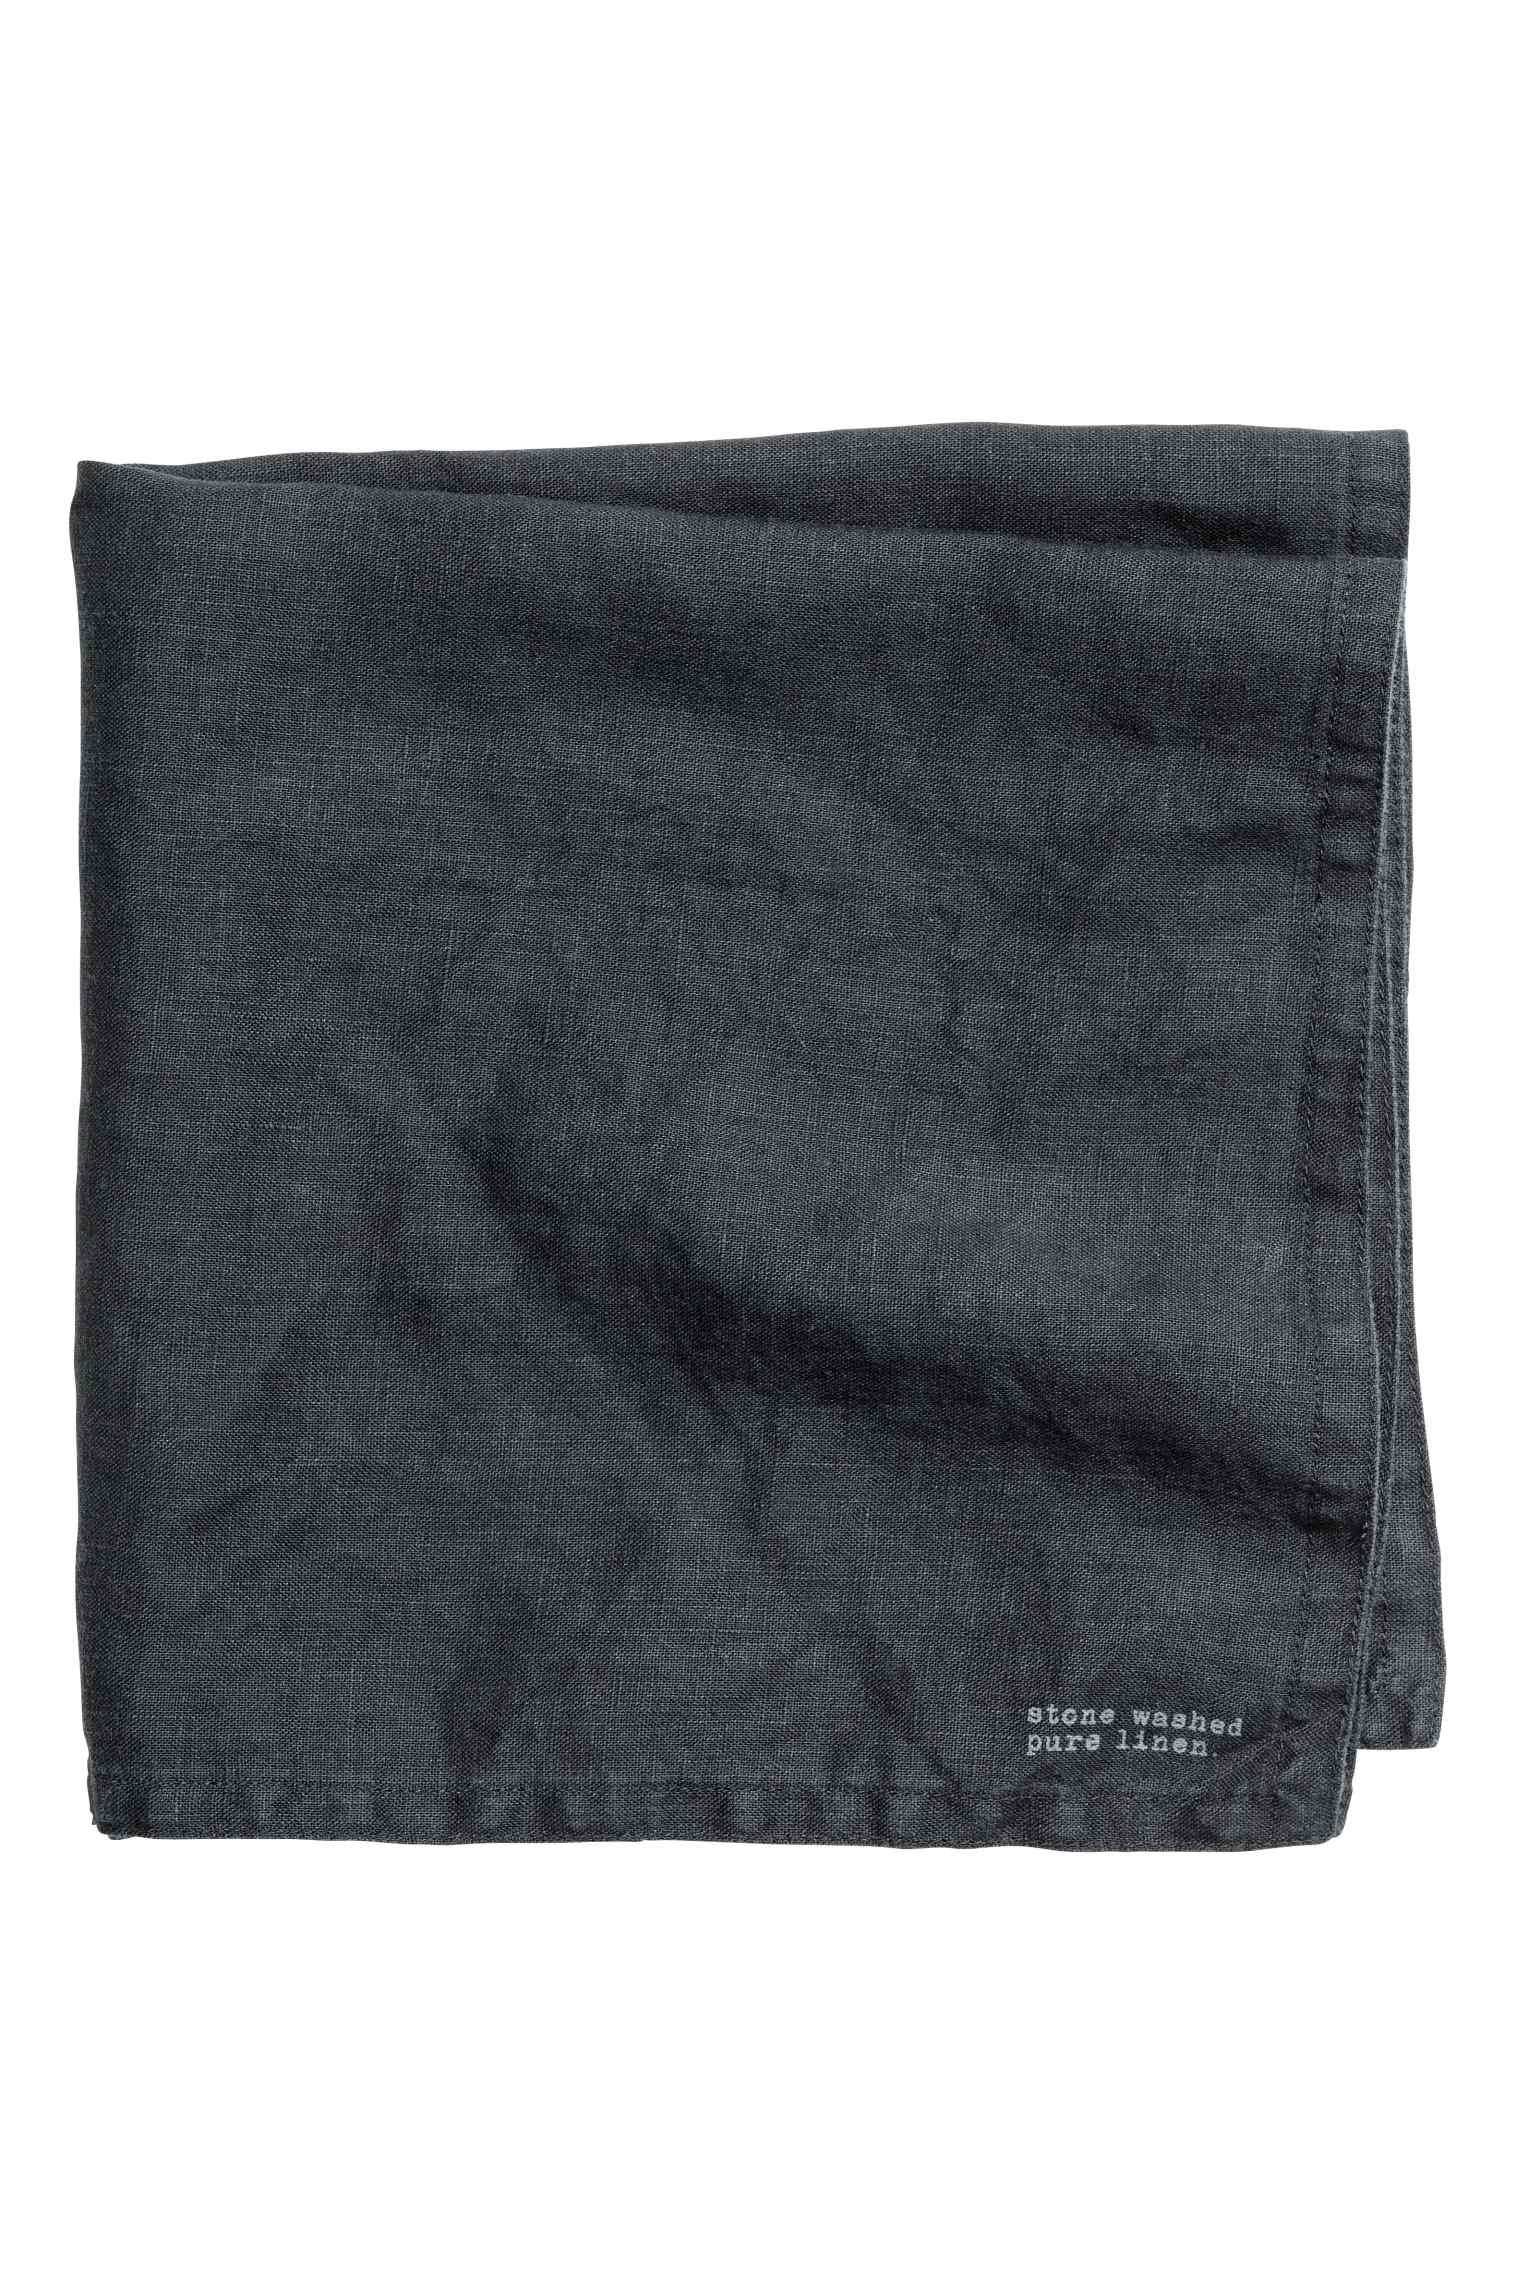 Washed linen napkin, $7